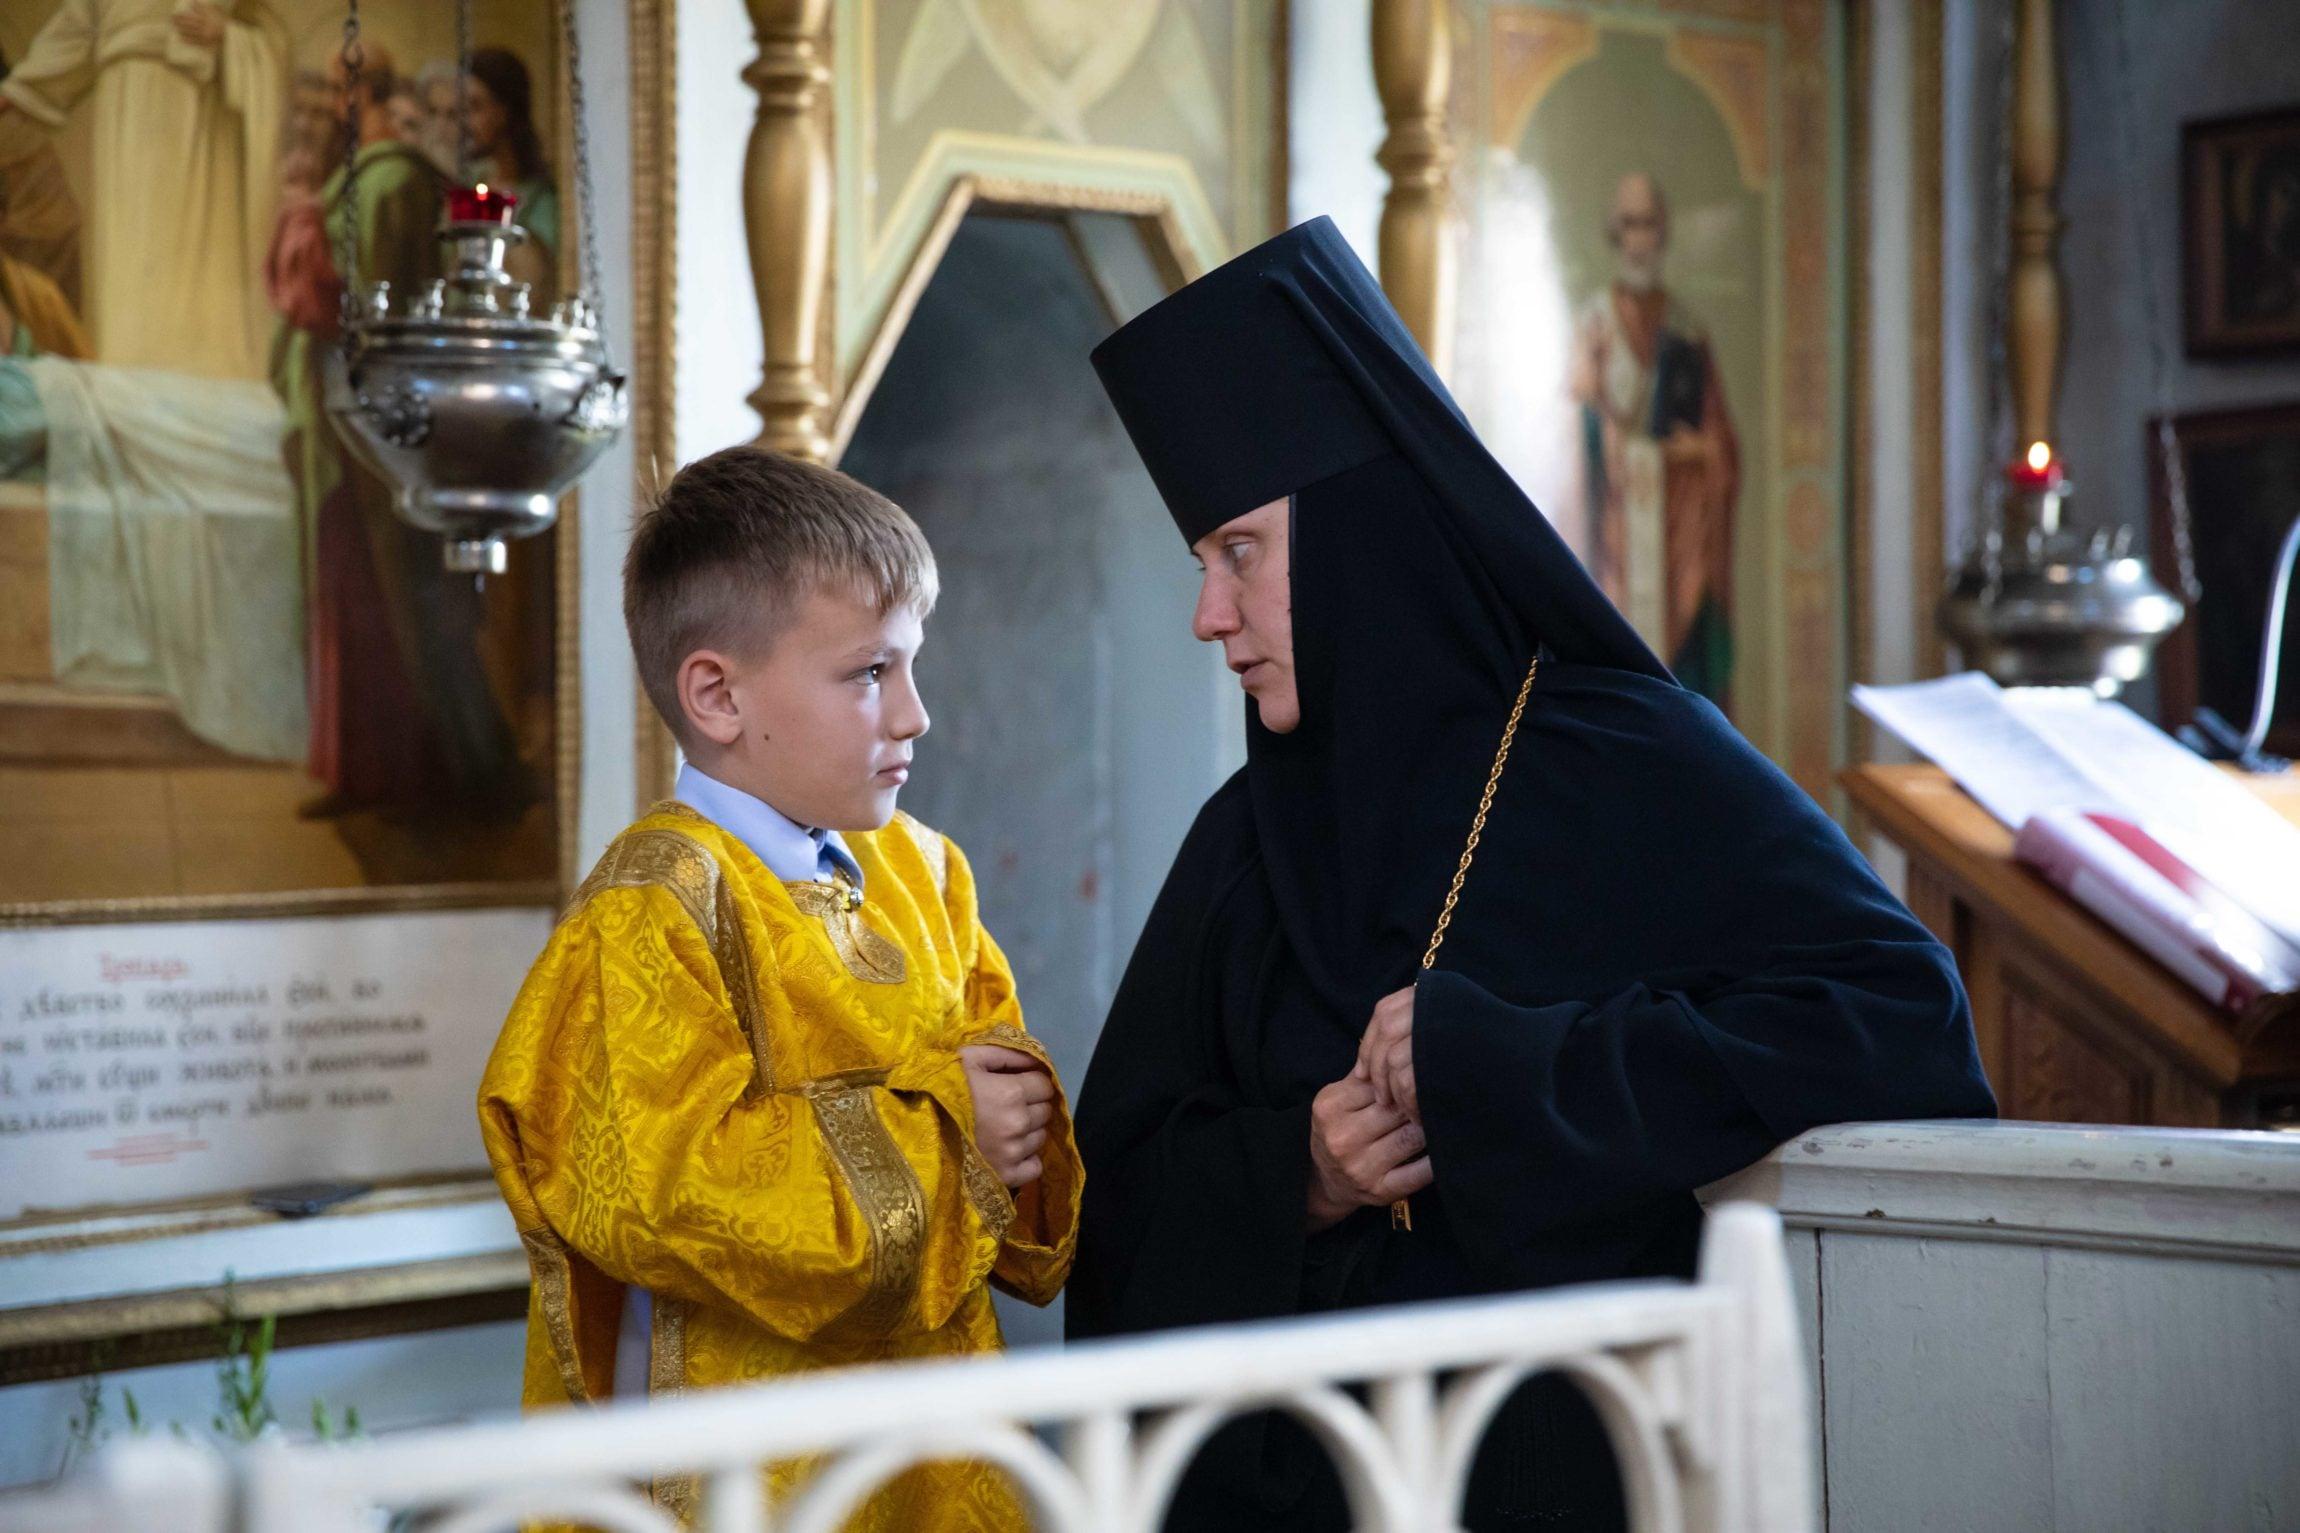 http://monuspen.ru/photoreports/143c0879173e3e11c82dee859362f232.jpg